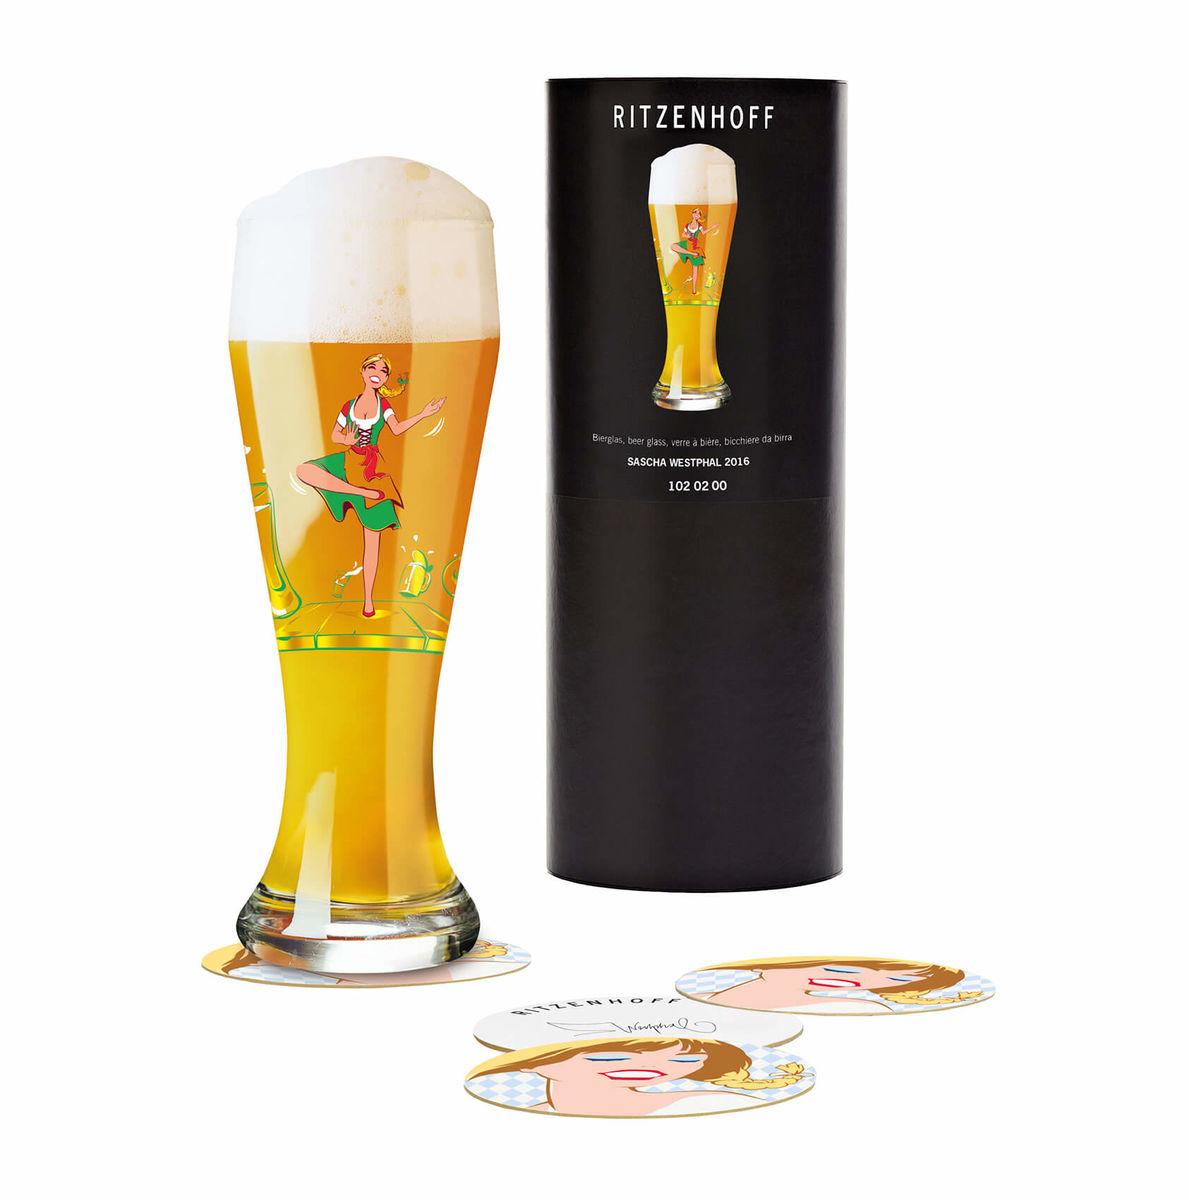 Ritzenhoff Sascha Westphal 2016 Weizenbierglas